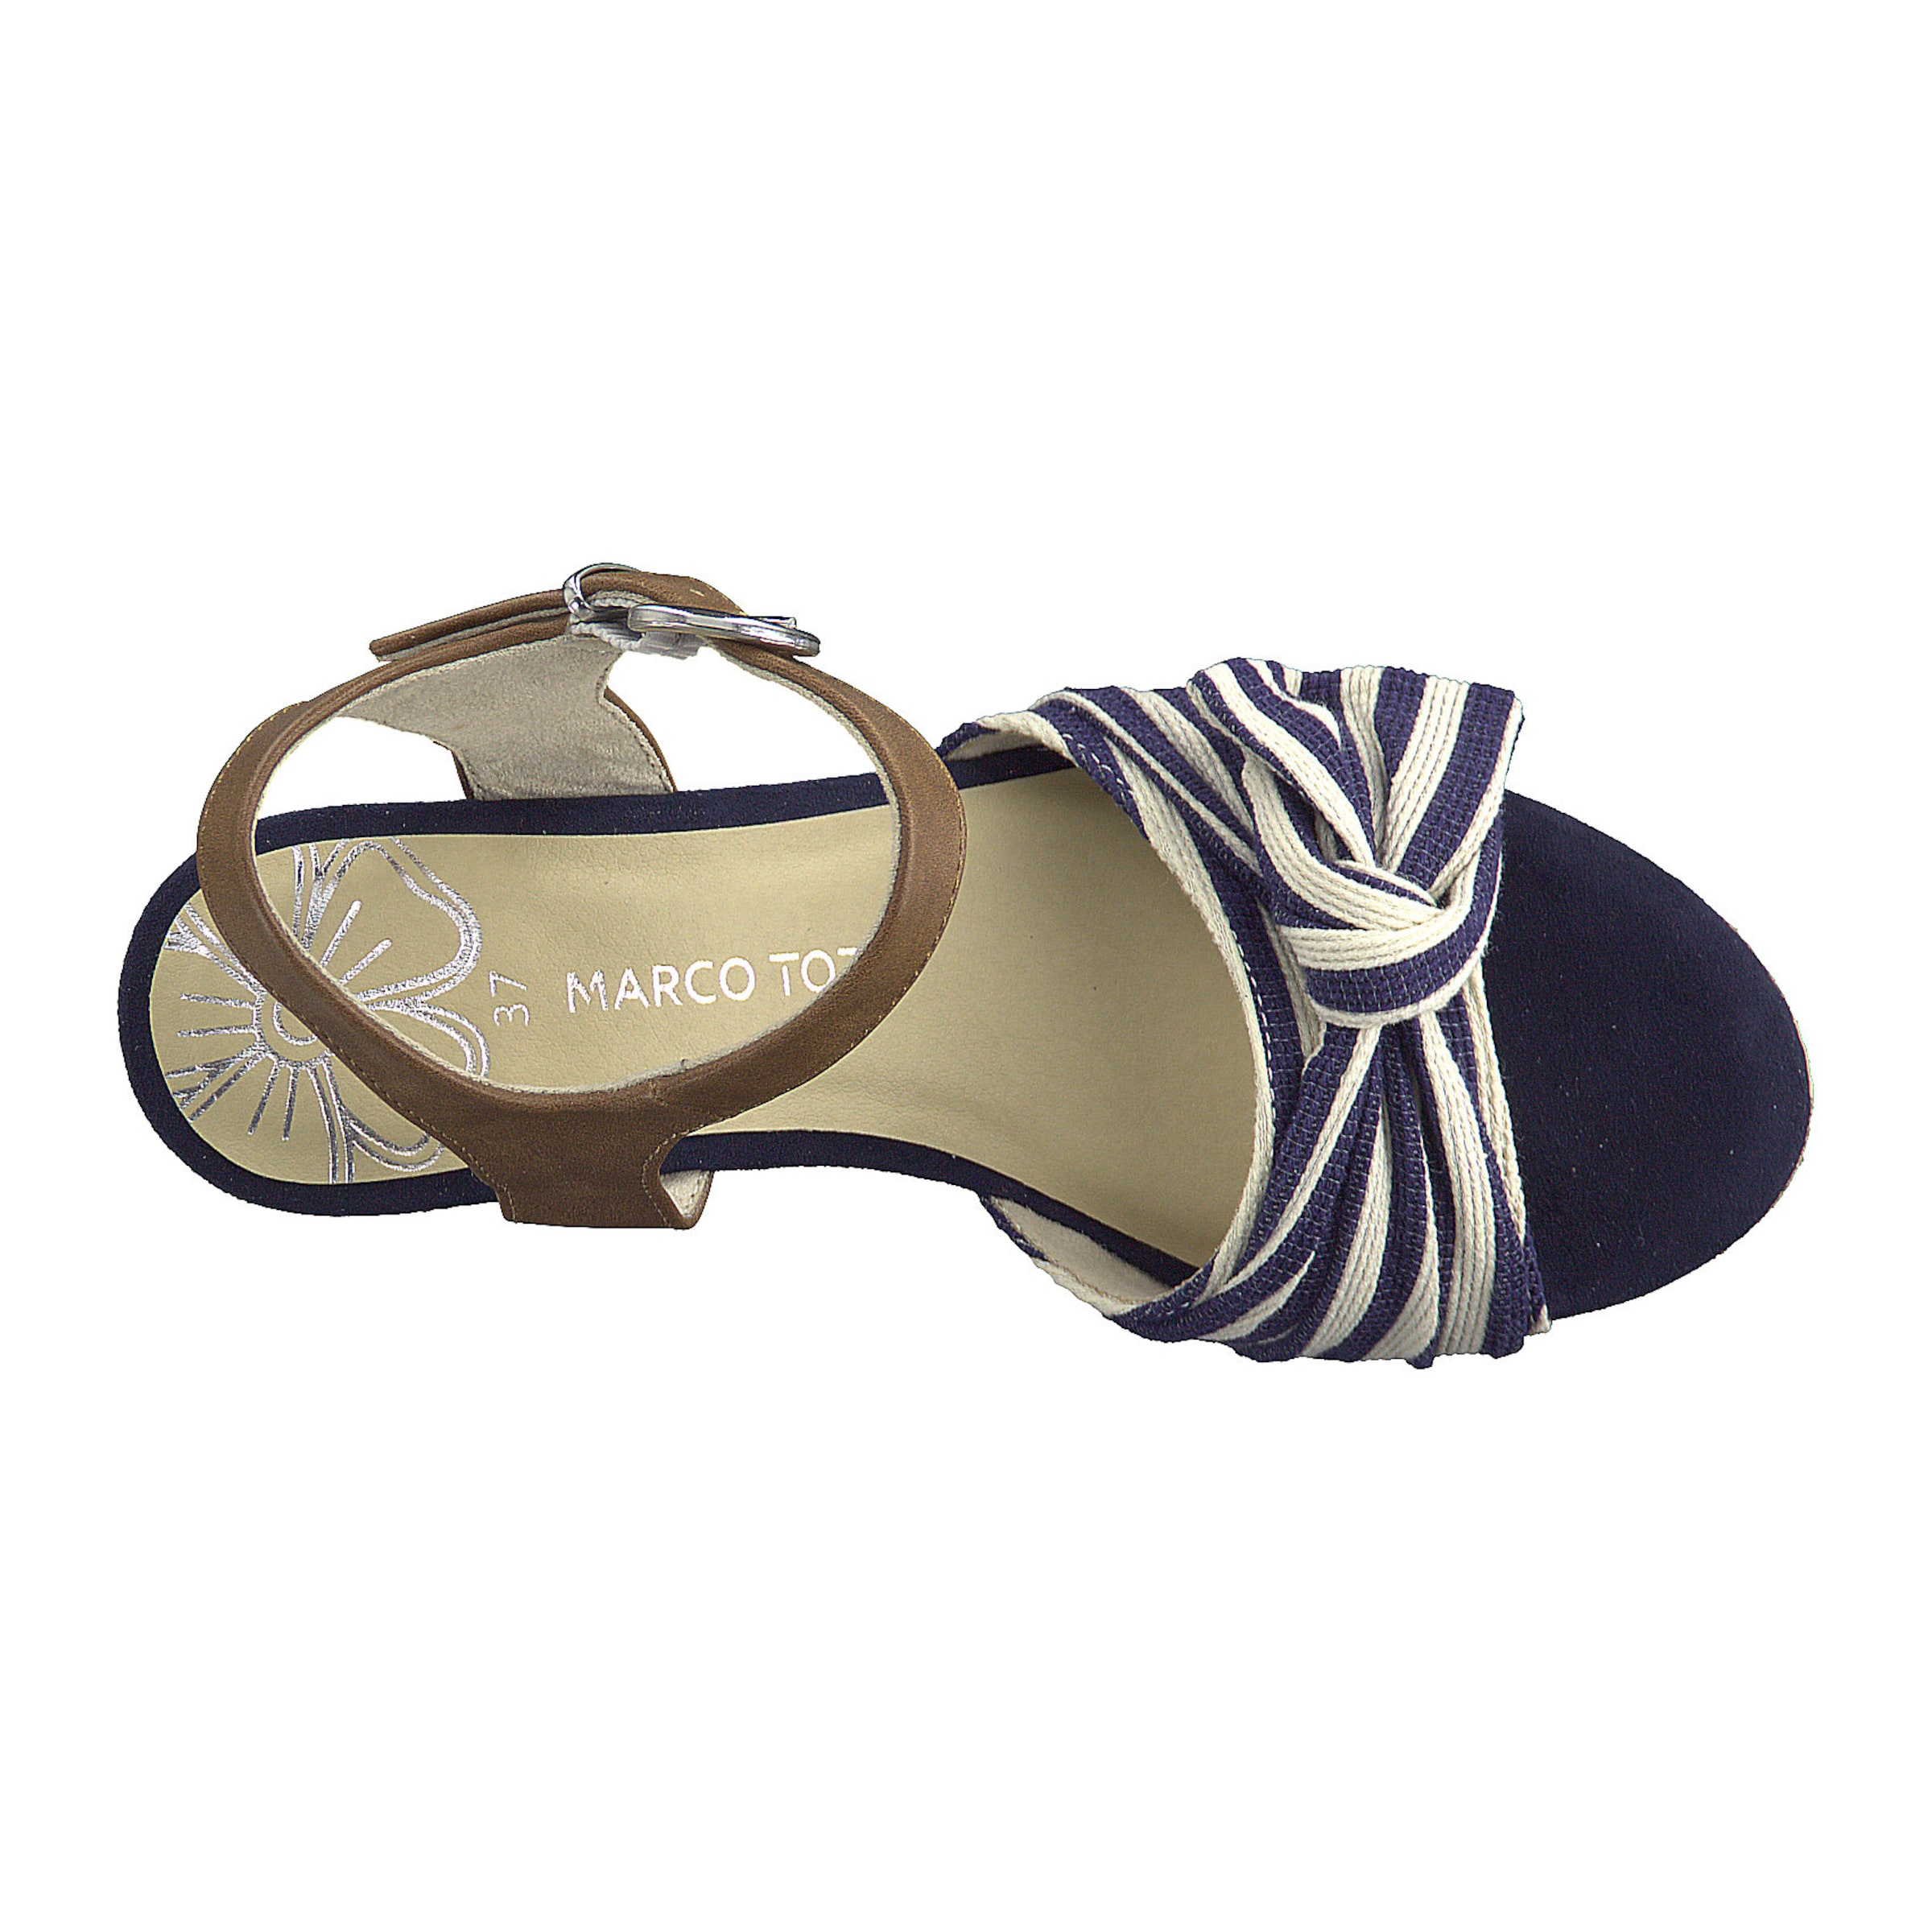 NudeMarine In Tozzi Marco Brokat Sandalette 1TlKJFc3